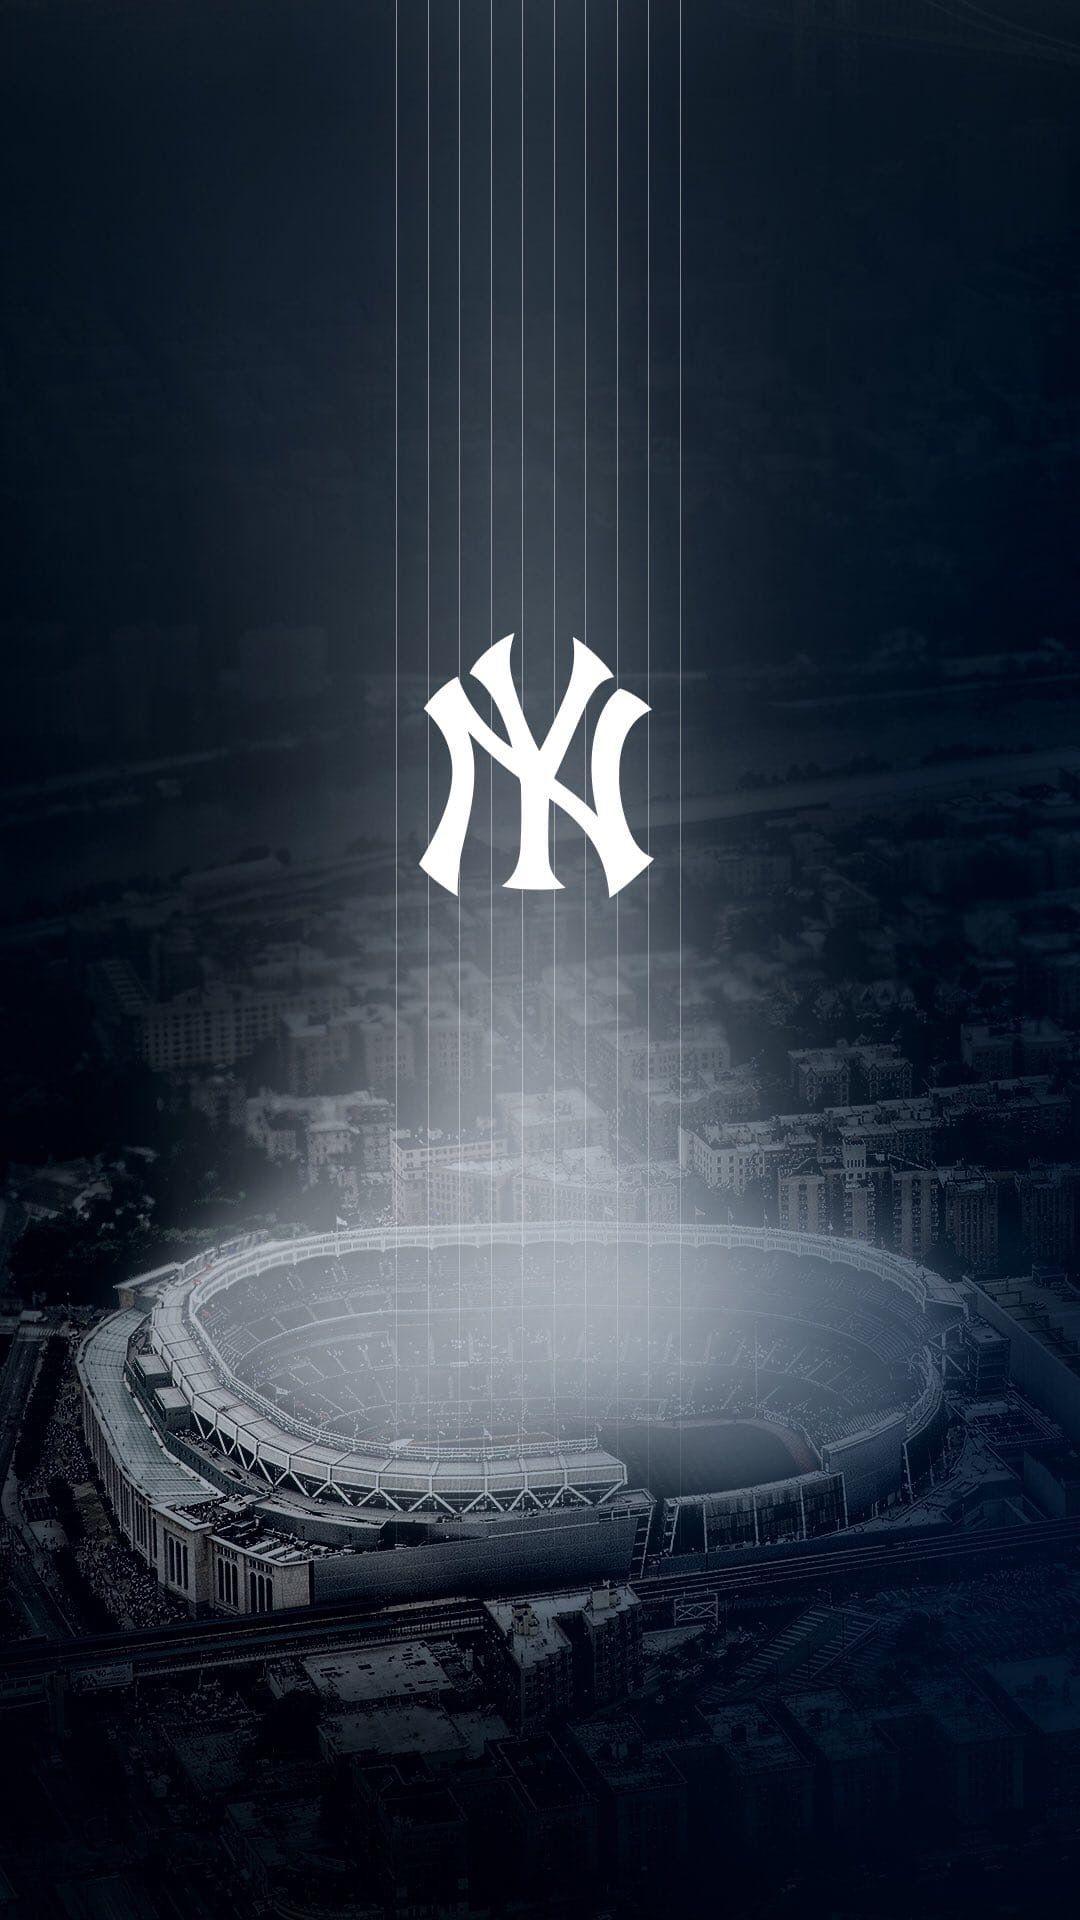 Pin by John Martin on Yankees in 2020 New york yankees